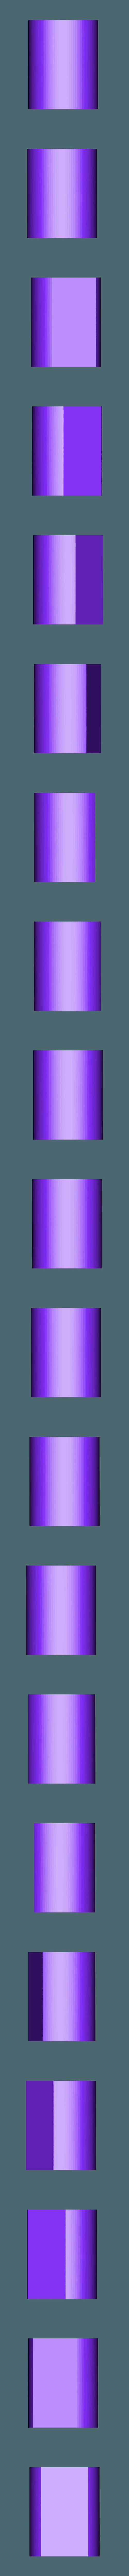 Top__Barrell_Plug.stl Télécharger fichier STL gratuit Borderlands Bandit Room Clener Shotgun • Modèle pour impression 3D, Dsk